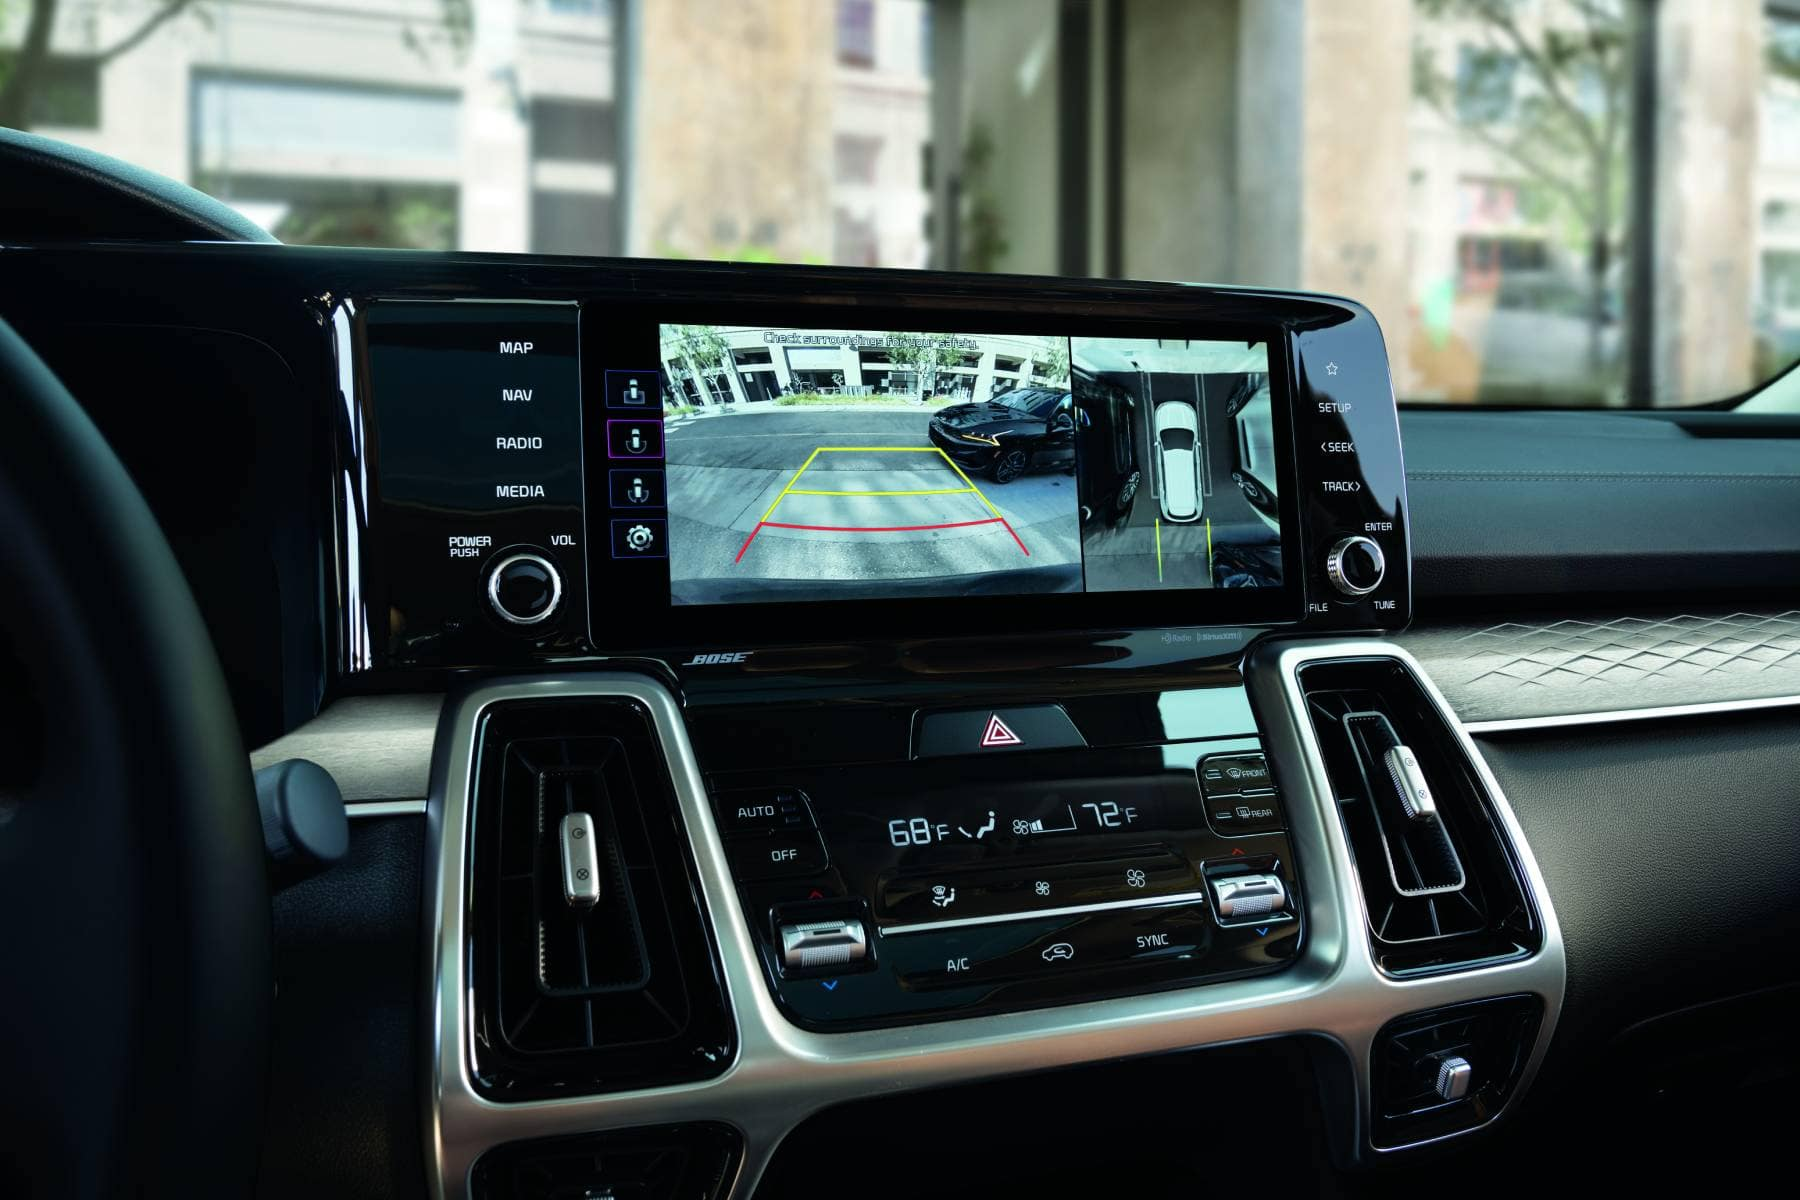 2021 Kia Sorento SX-Prestige Interior Dash Screen - Pat ...